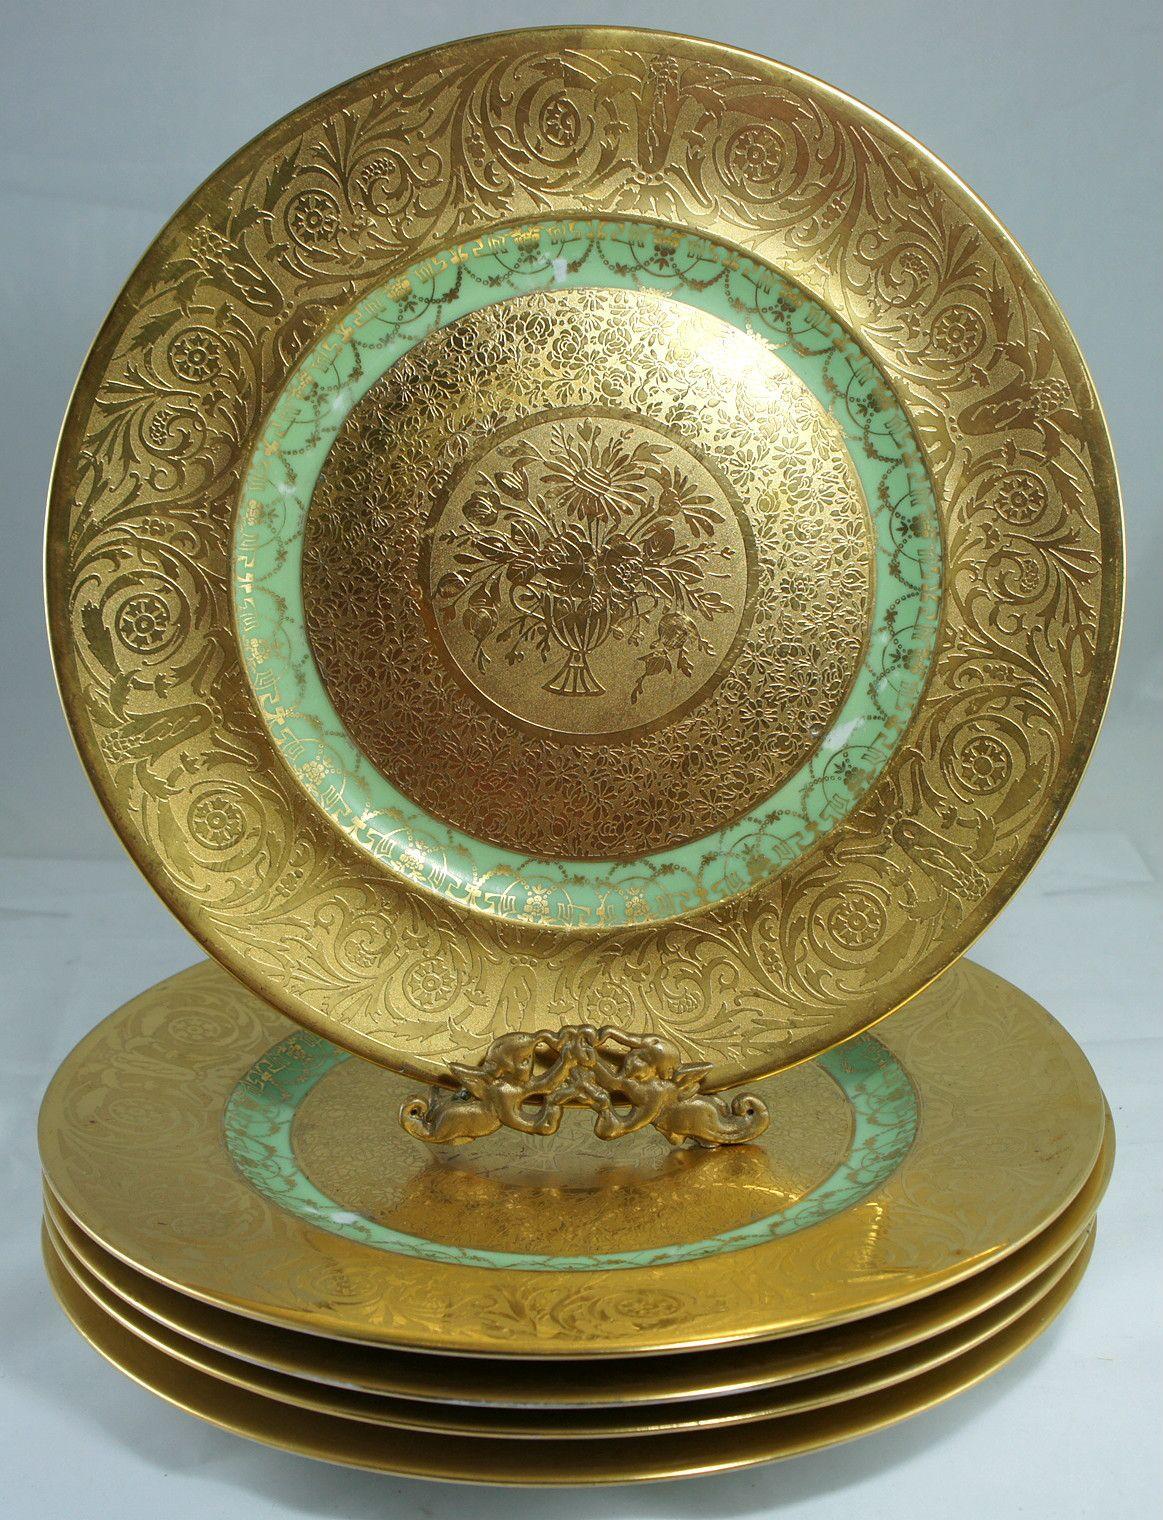 Limoges Royal China | Limoges | Pinterest | China, Royals and Porcelain